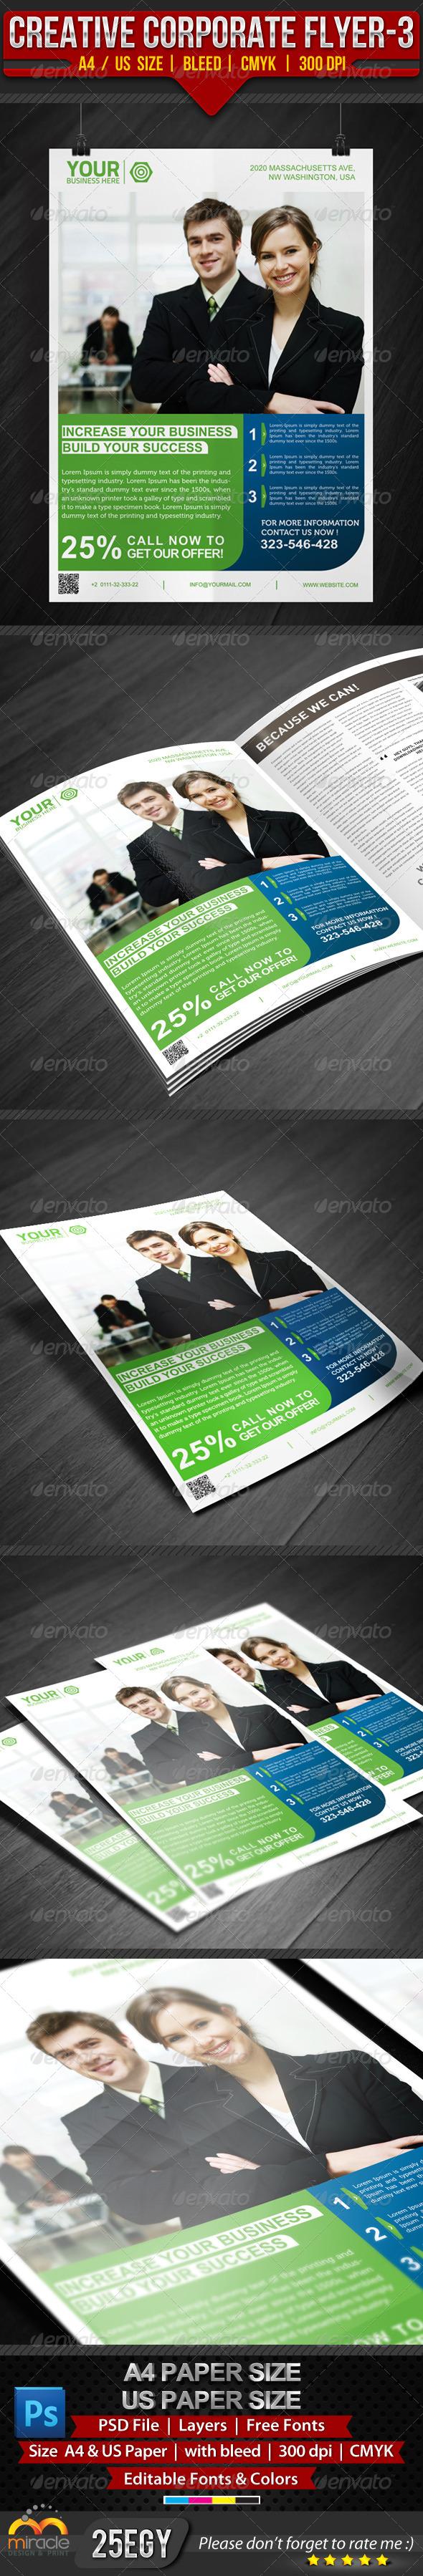 Creative Corporate Flyer 3 - Corporate Flyers